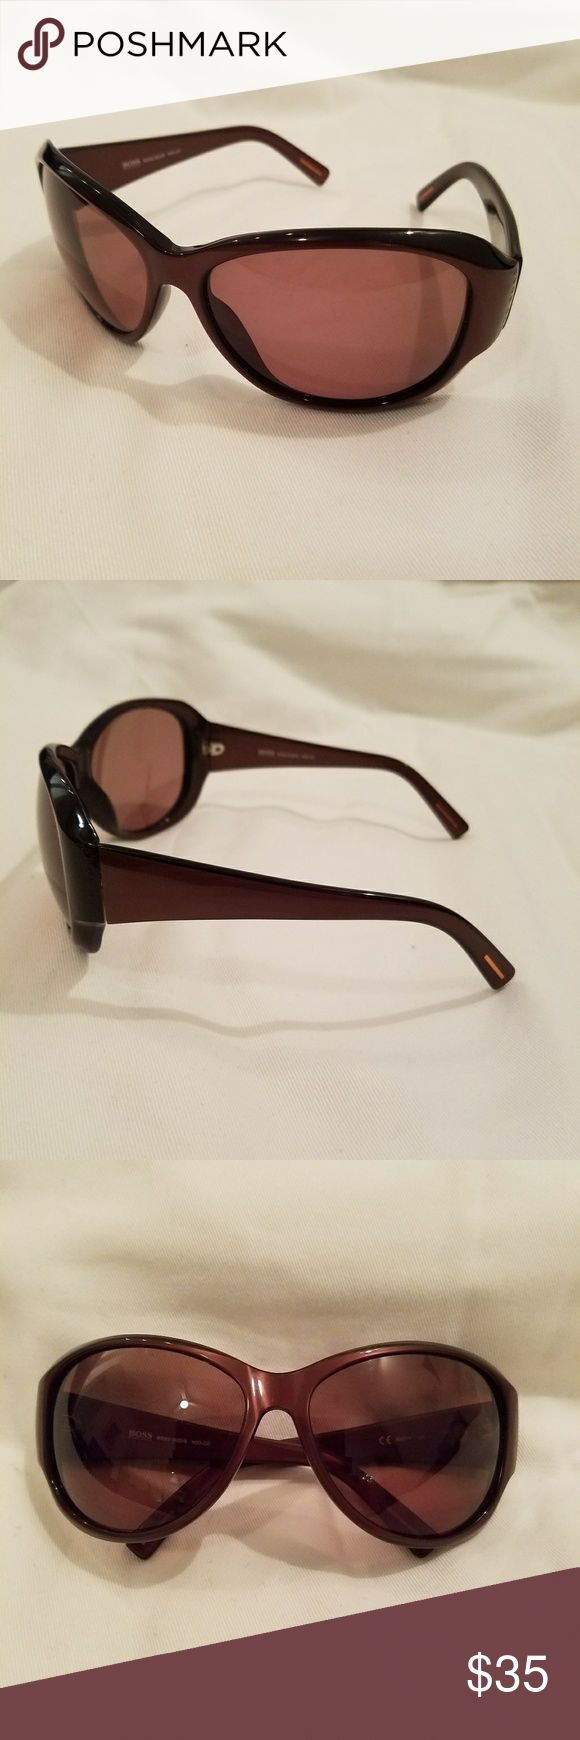 Hugo Boss womens sunglasses Like new, never worn. Rich wine-brown colour. Very glamorous!! Hugo Boss Accessories Sunglasses